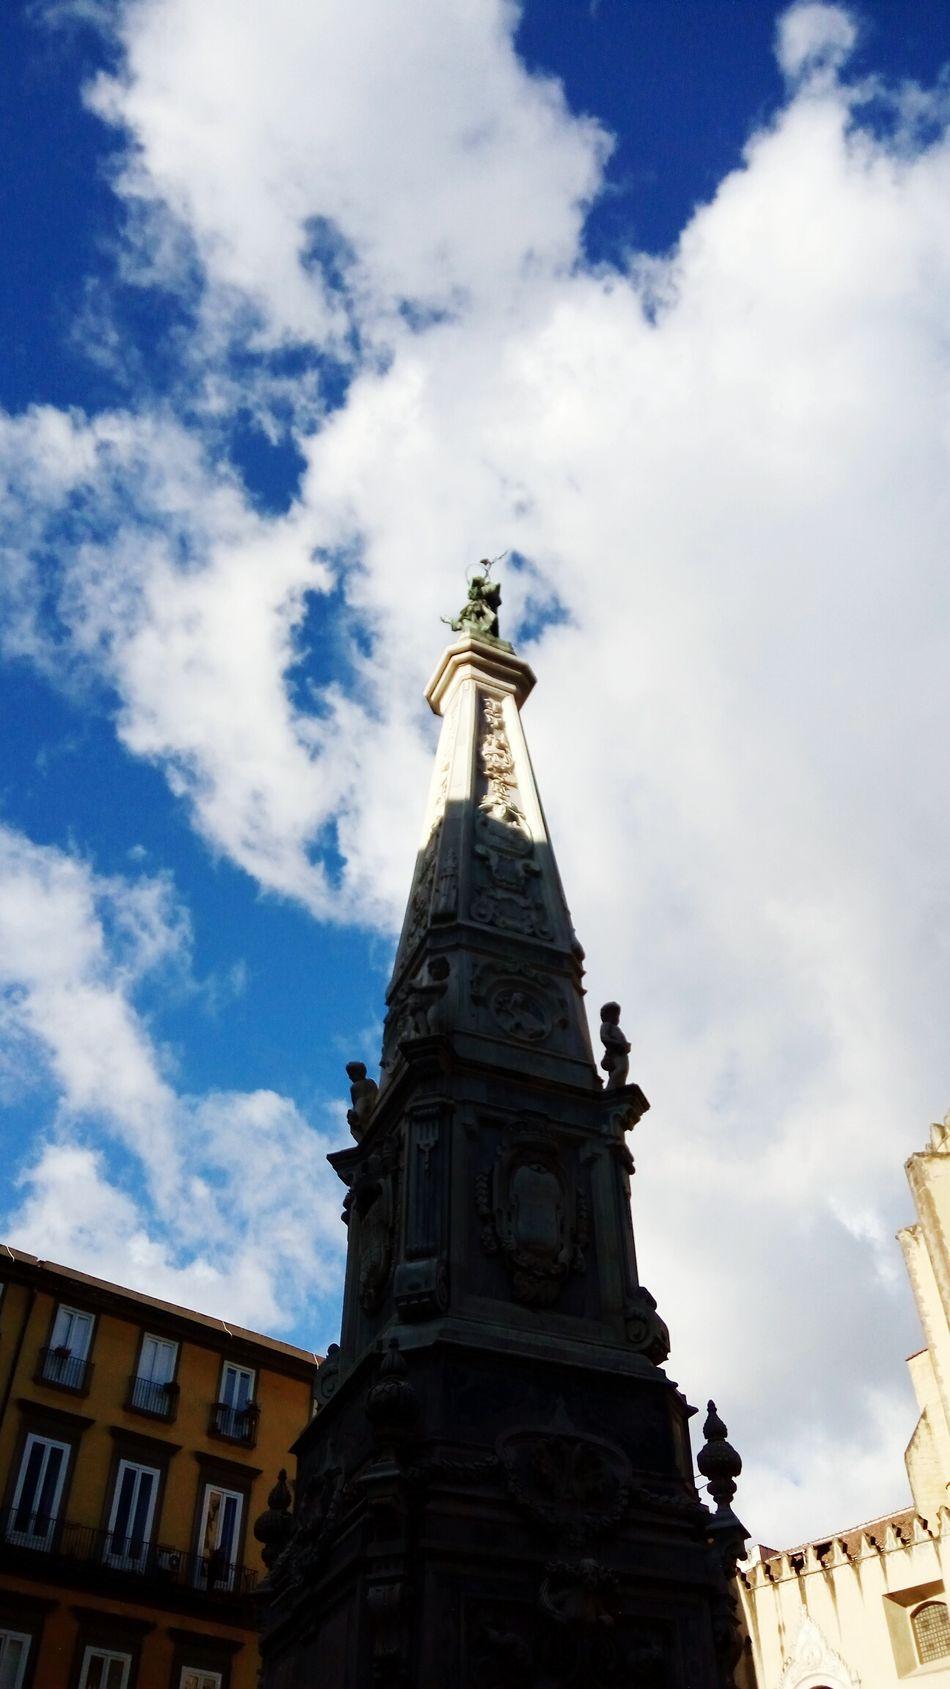 Sky Travel Destinations Architecture Tourism Built Structure No People Napoli Naples Piazza San Domenico Guglia